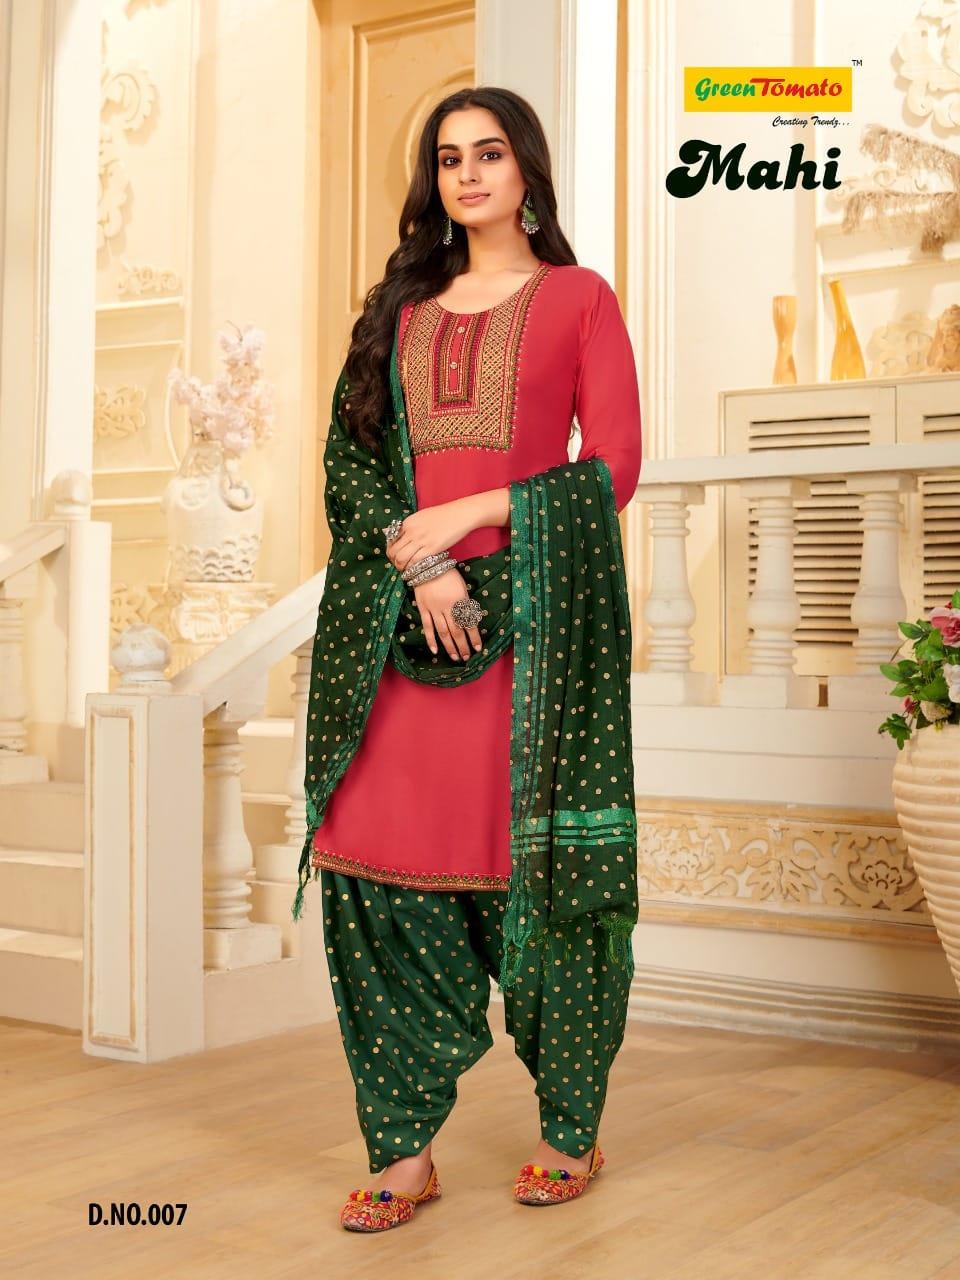 Green Tomato Mahi Readymade Patiyala Suits Catalog Lowest Price